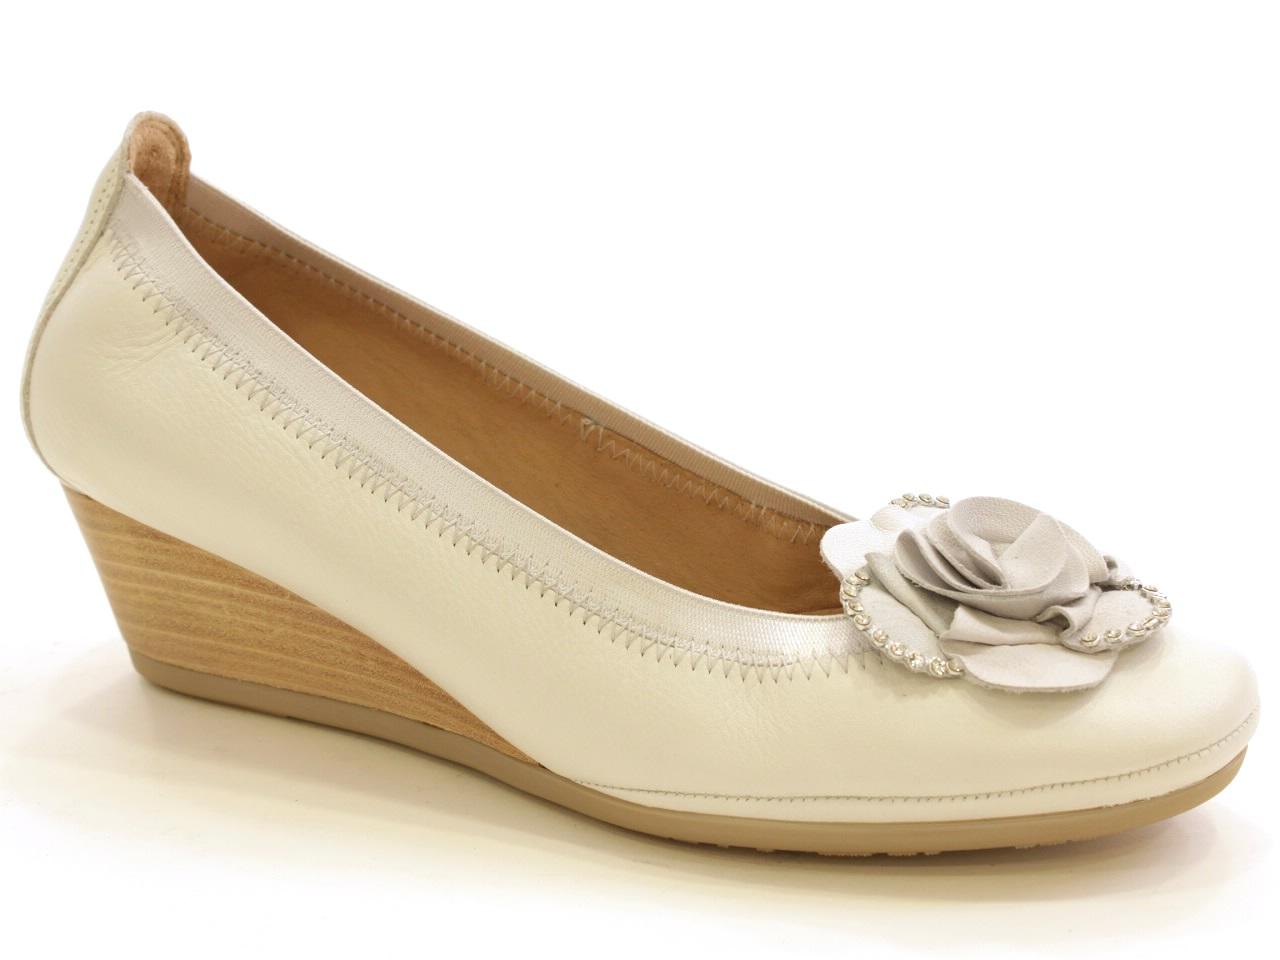 Wedge Shoes Hispanitas - 165 HV49388